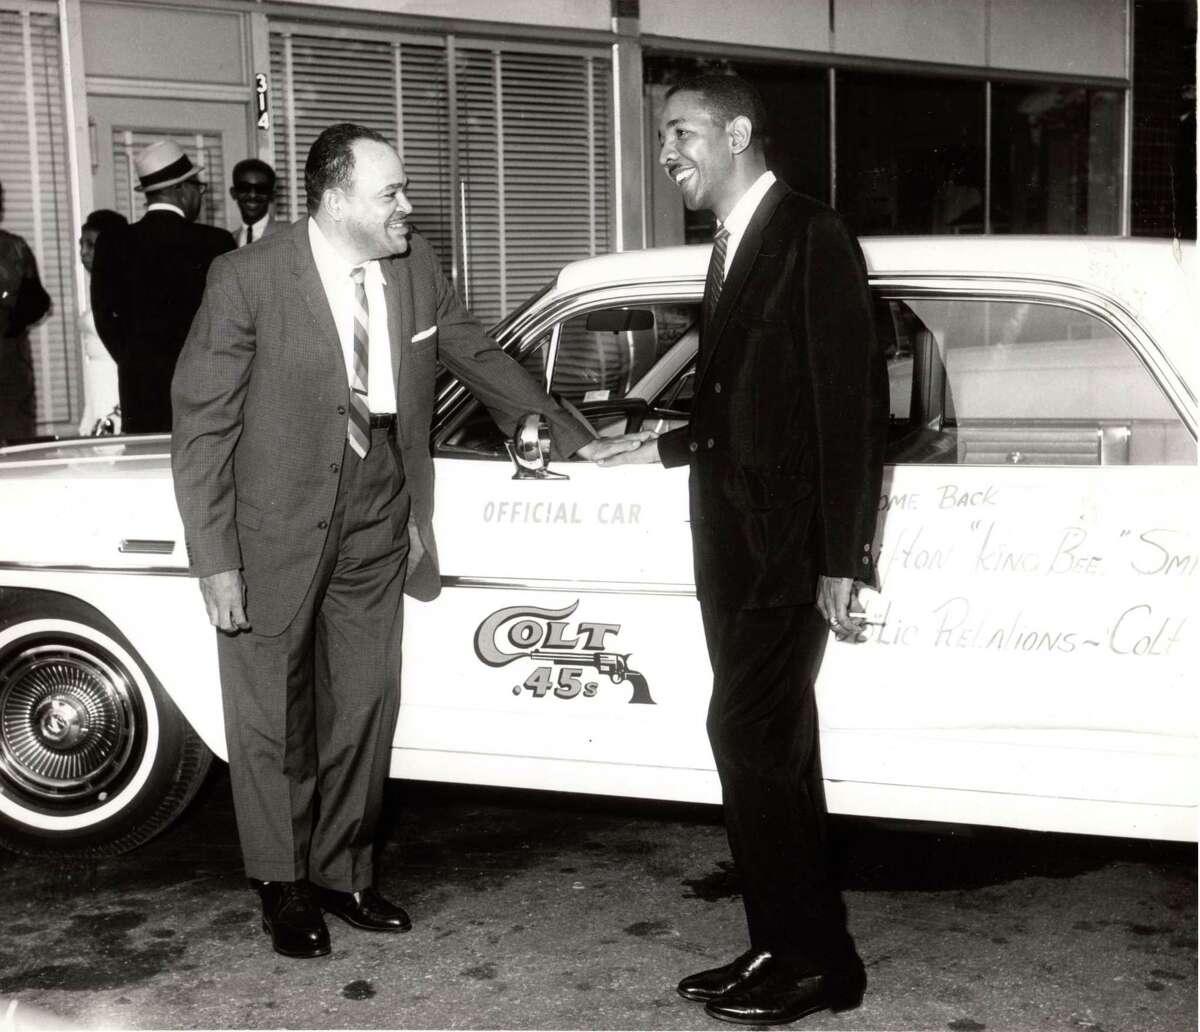 Houston jazz great Arnett Cobb, left, pictured in 1963 with the Houston Colt .45s car.